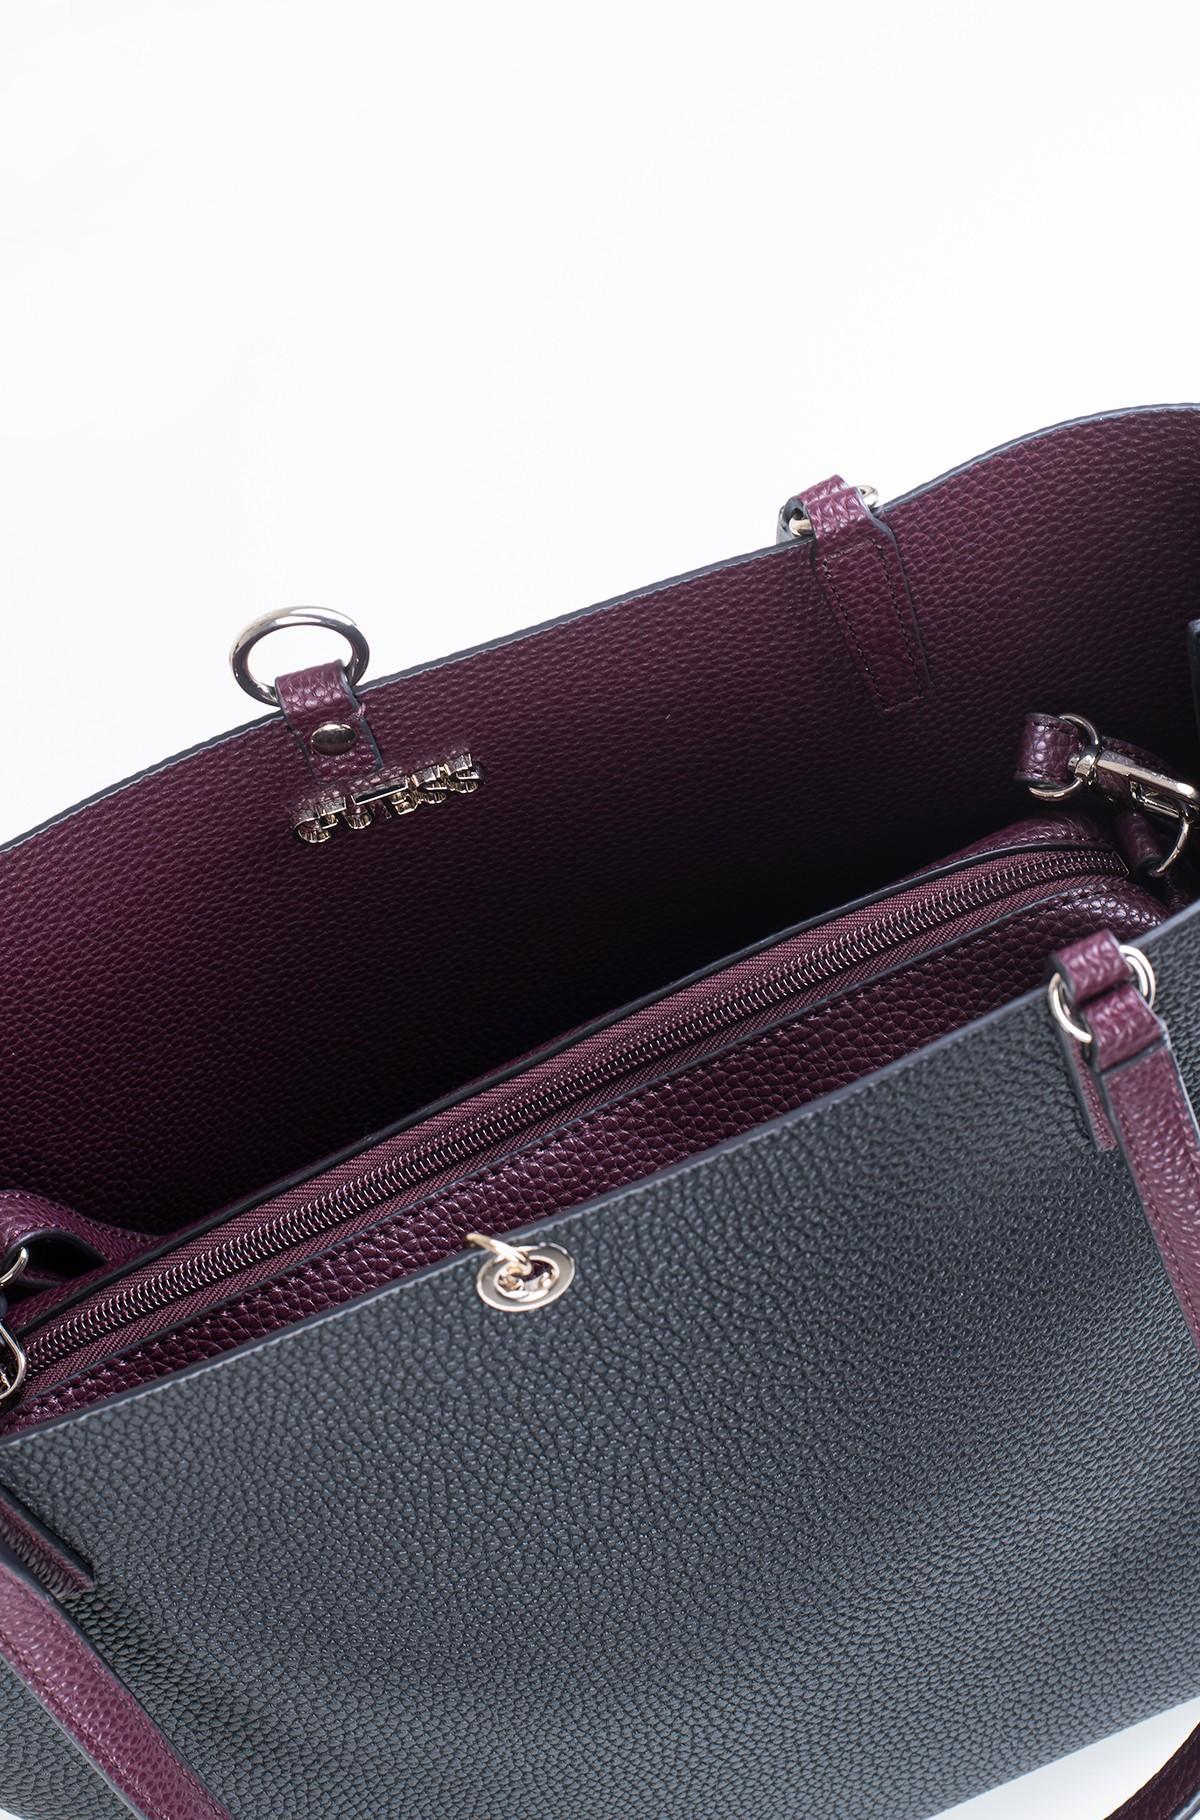 Handbag HWOB74 55230-full-3